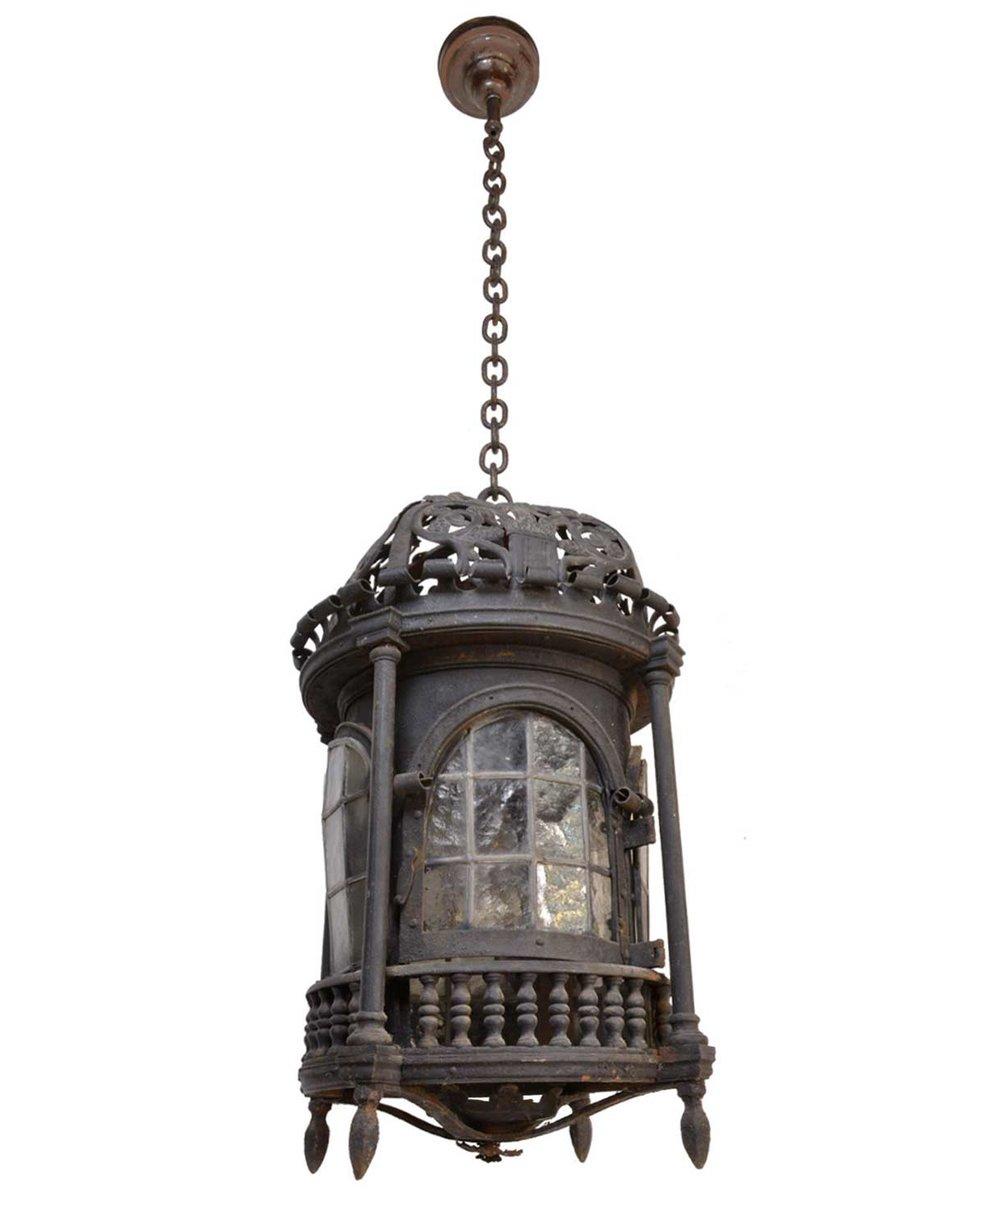 46623-iron-lantern-with-doors-BELOW-VIEW.jpg